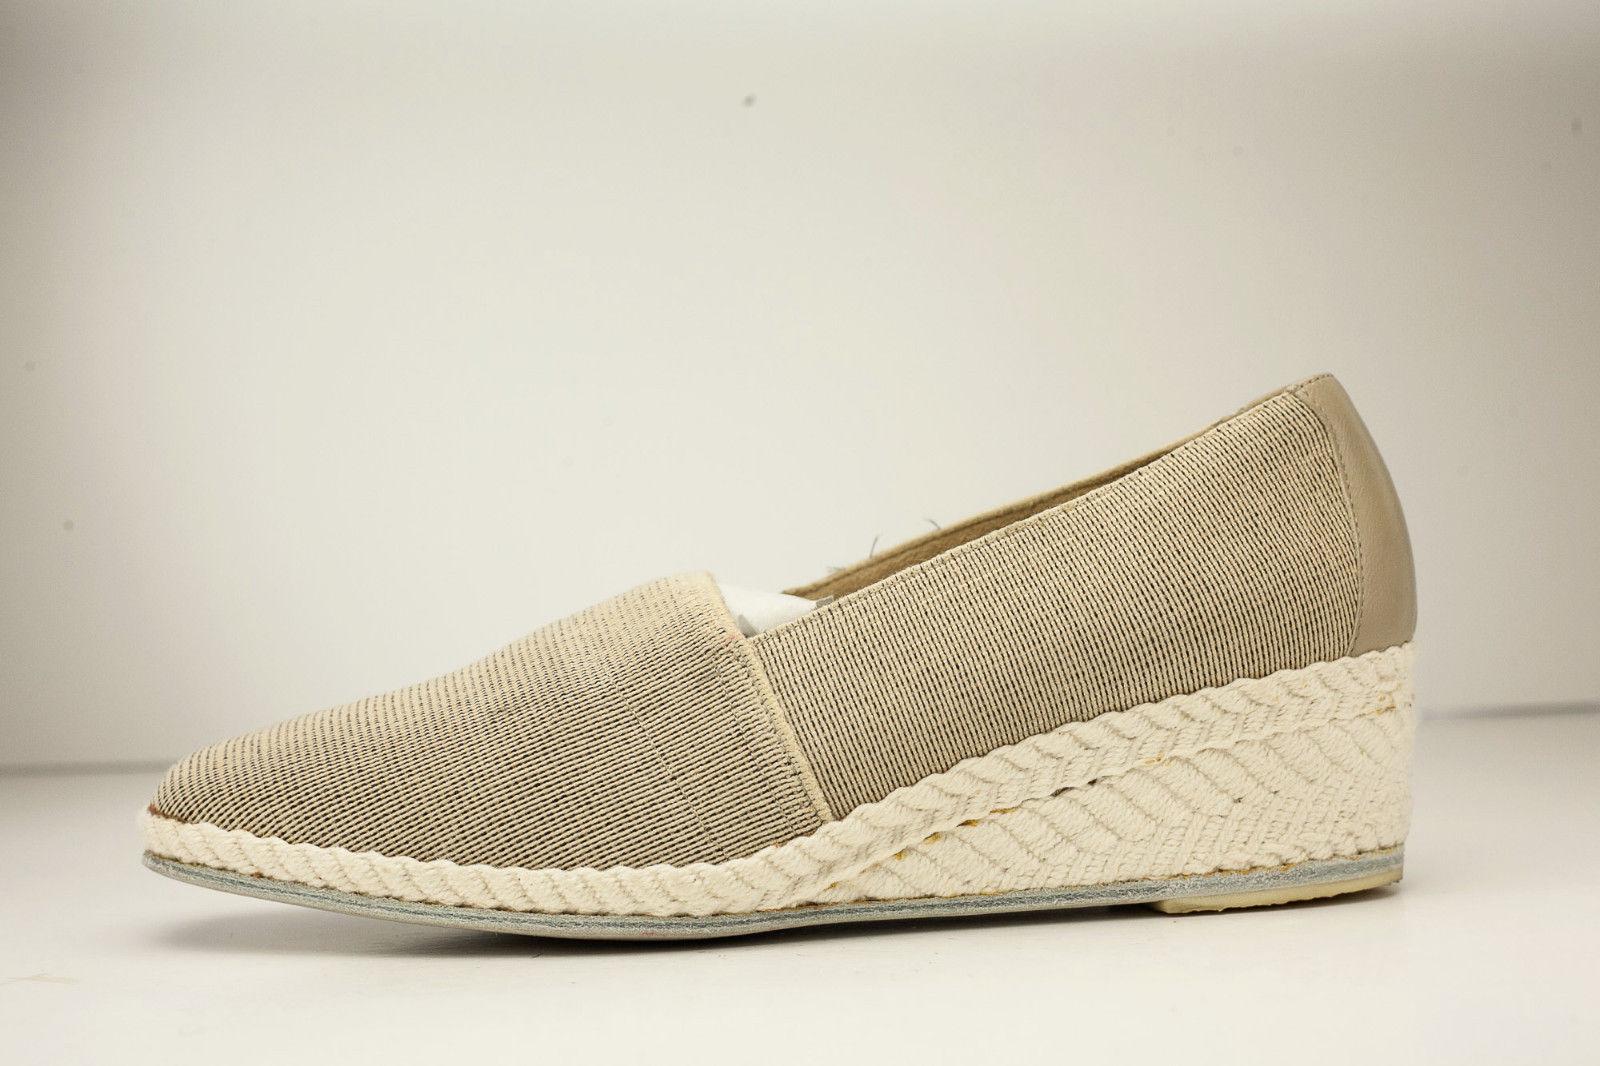 Amalfi 6 Brown Espadrilles Women's Shoes Spain